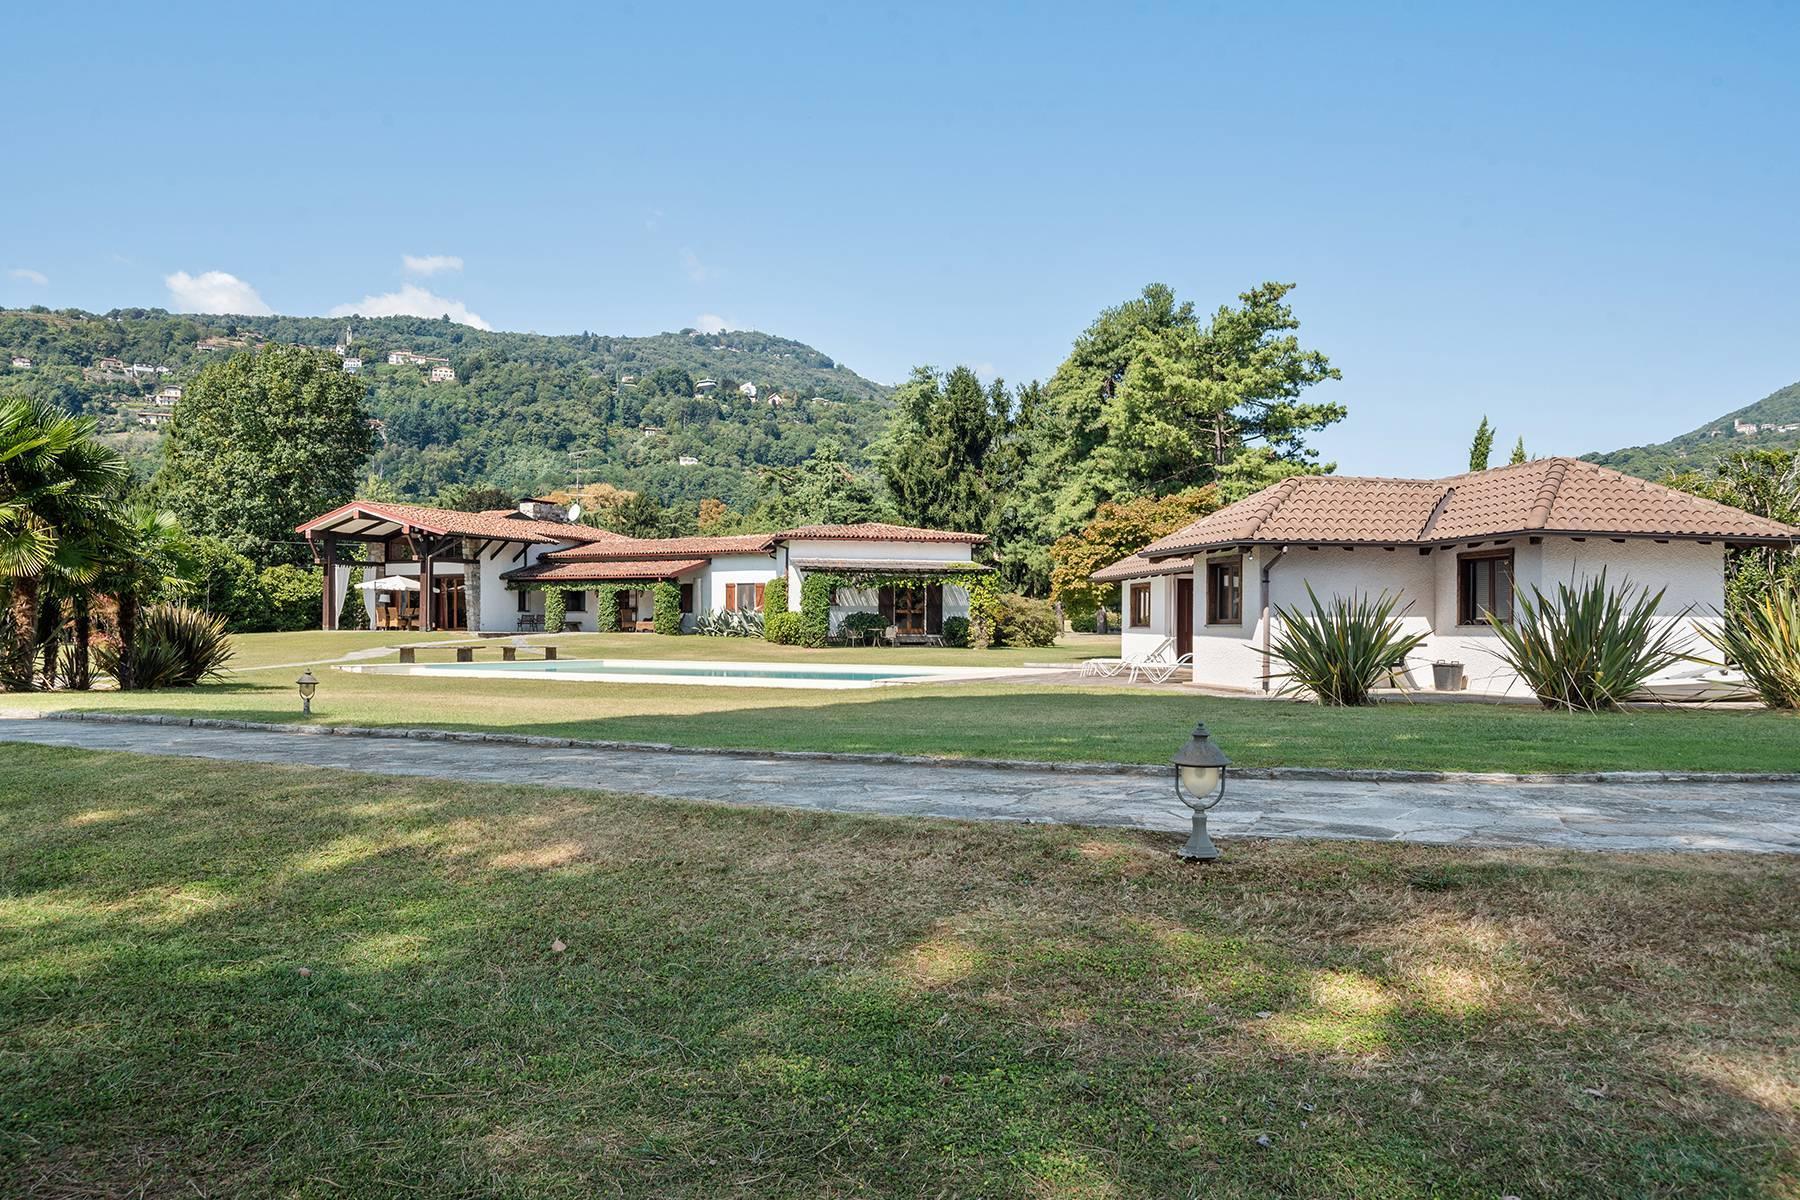 Charmante Villa in Lesa, mitten in der Natur - 50